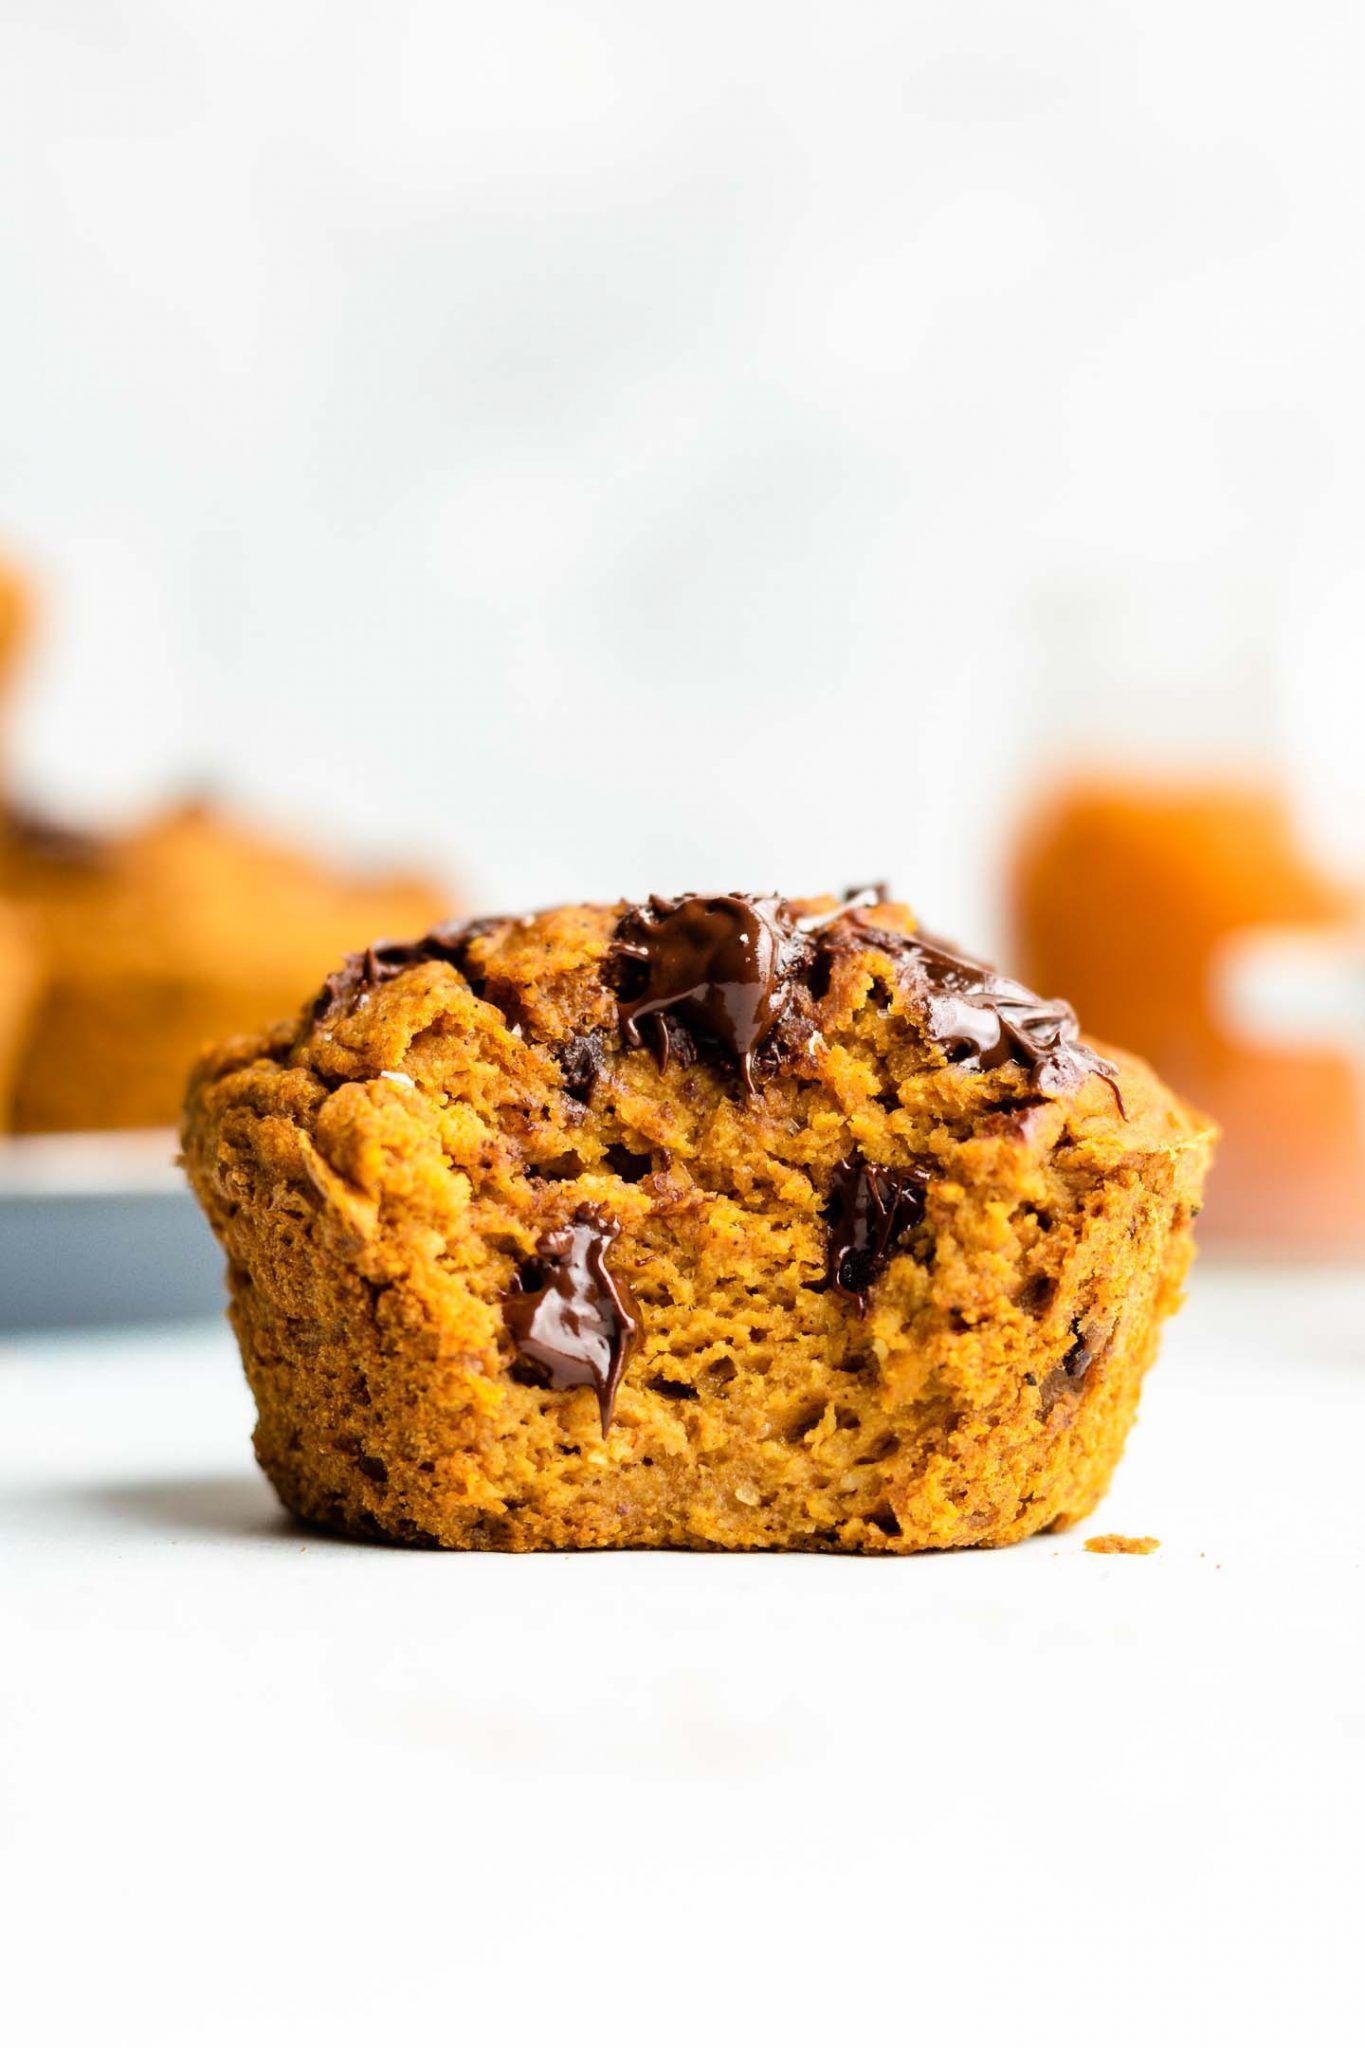 50+ Delicious Pumpkin Recipes Everyone Will Love -